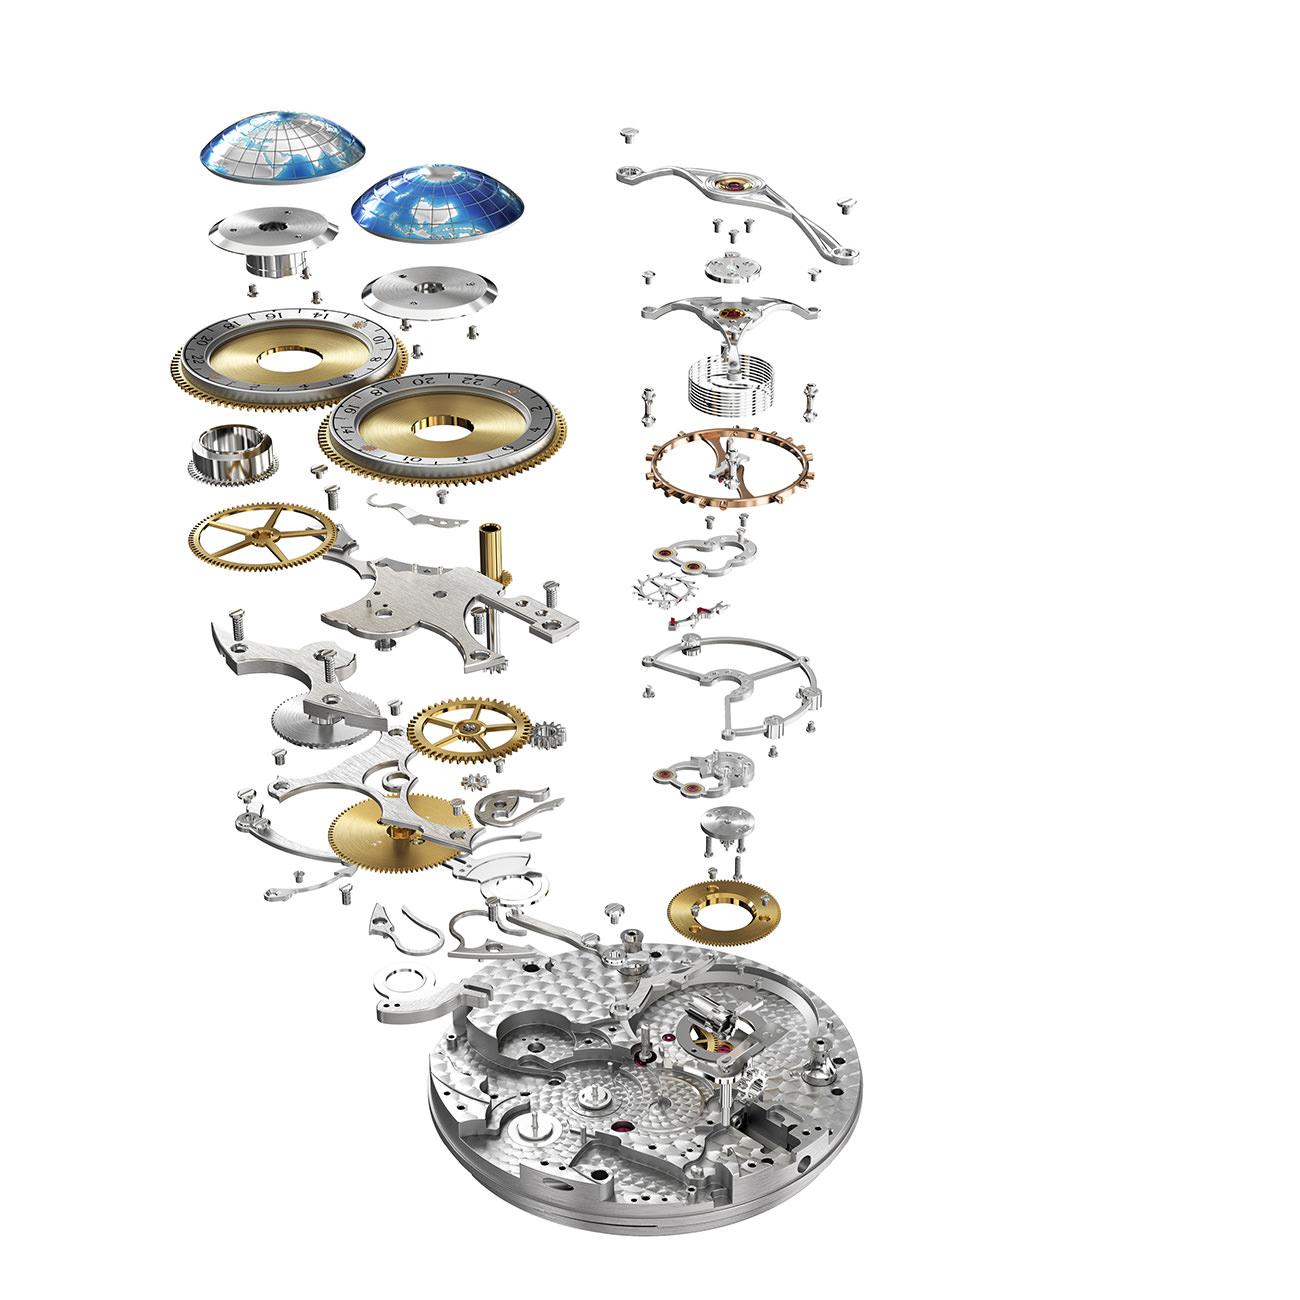 montblanc-tourbillon-cylindrique-geosphere-vasco-da-gama-10